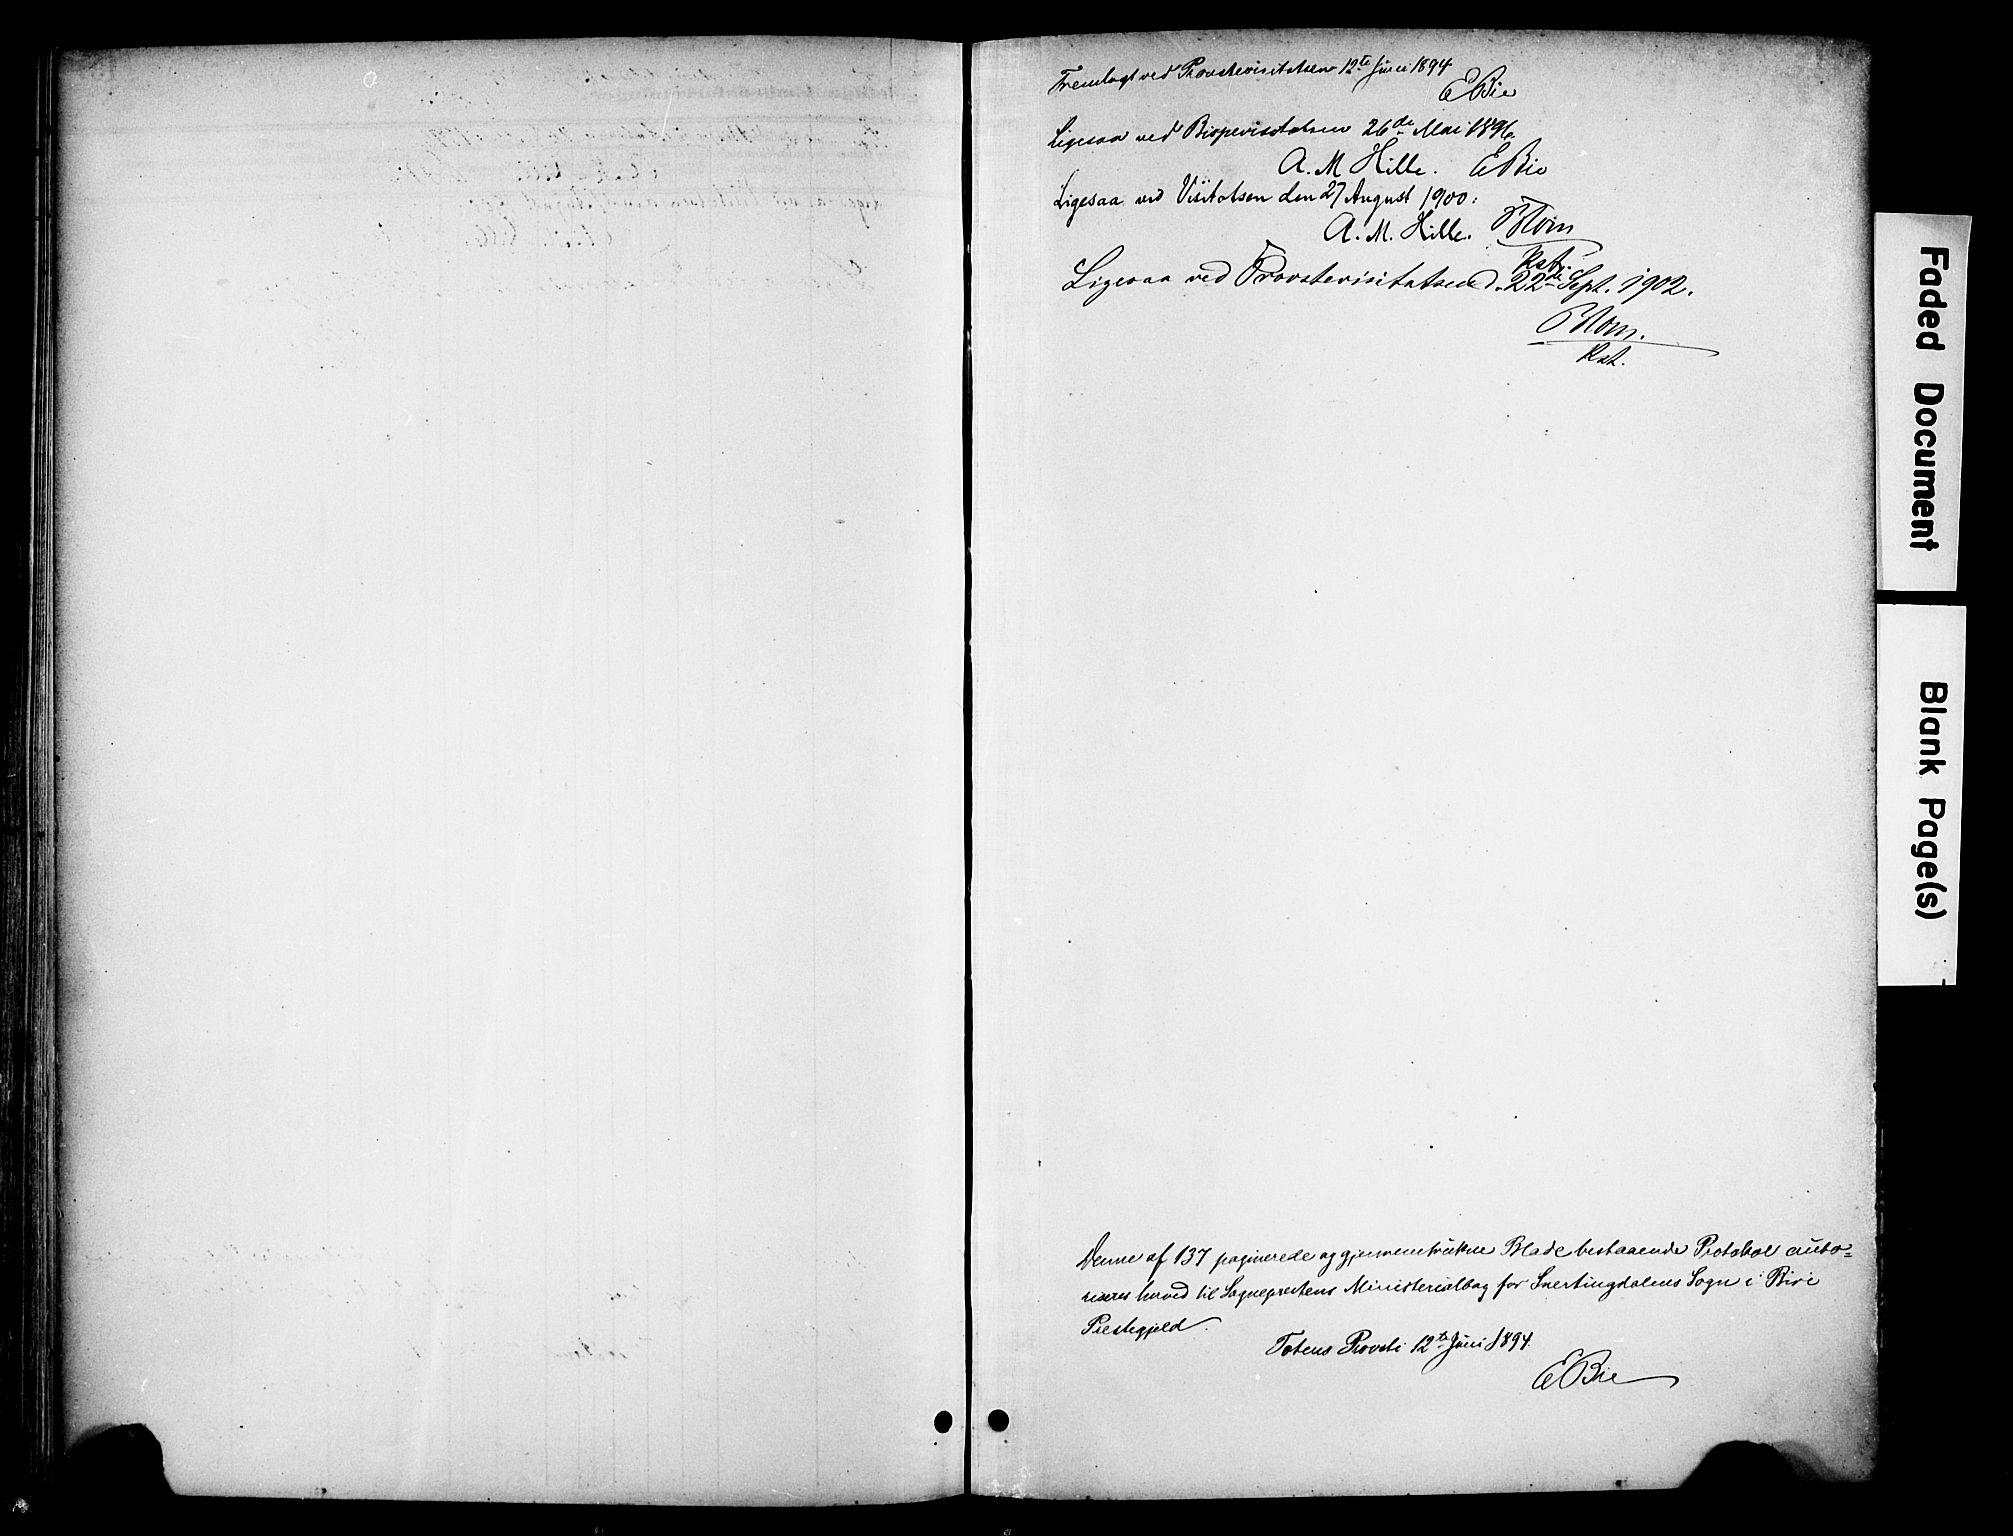 SAH, Biri prestekontor, Ministerialbok nr. 8, 1894-1901, s. 123